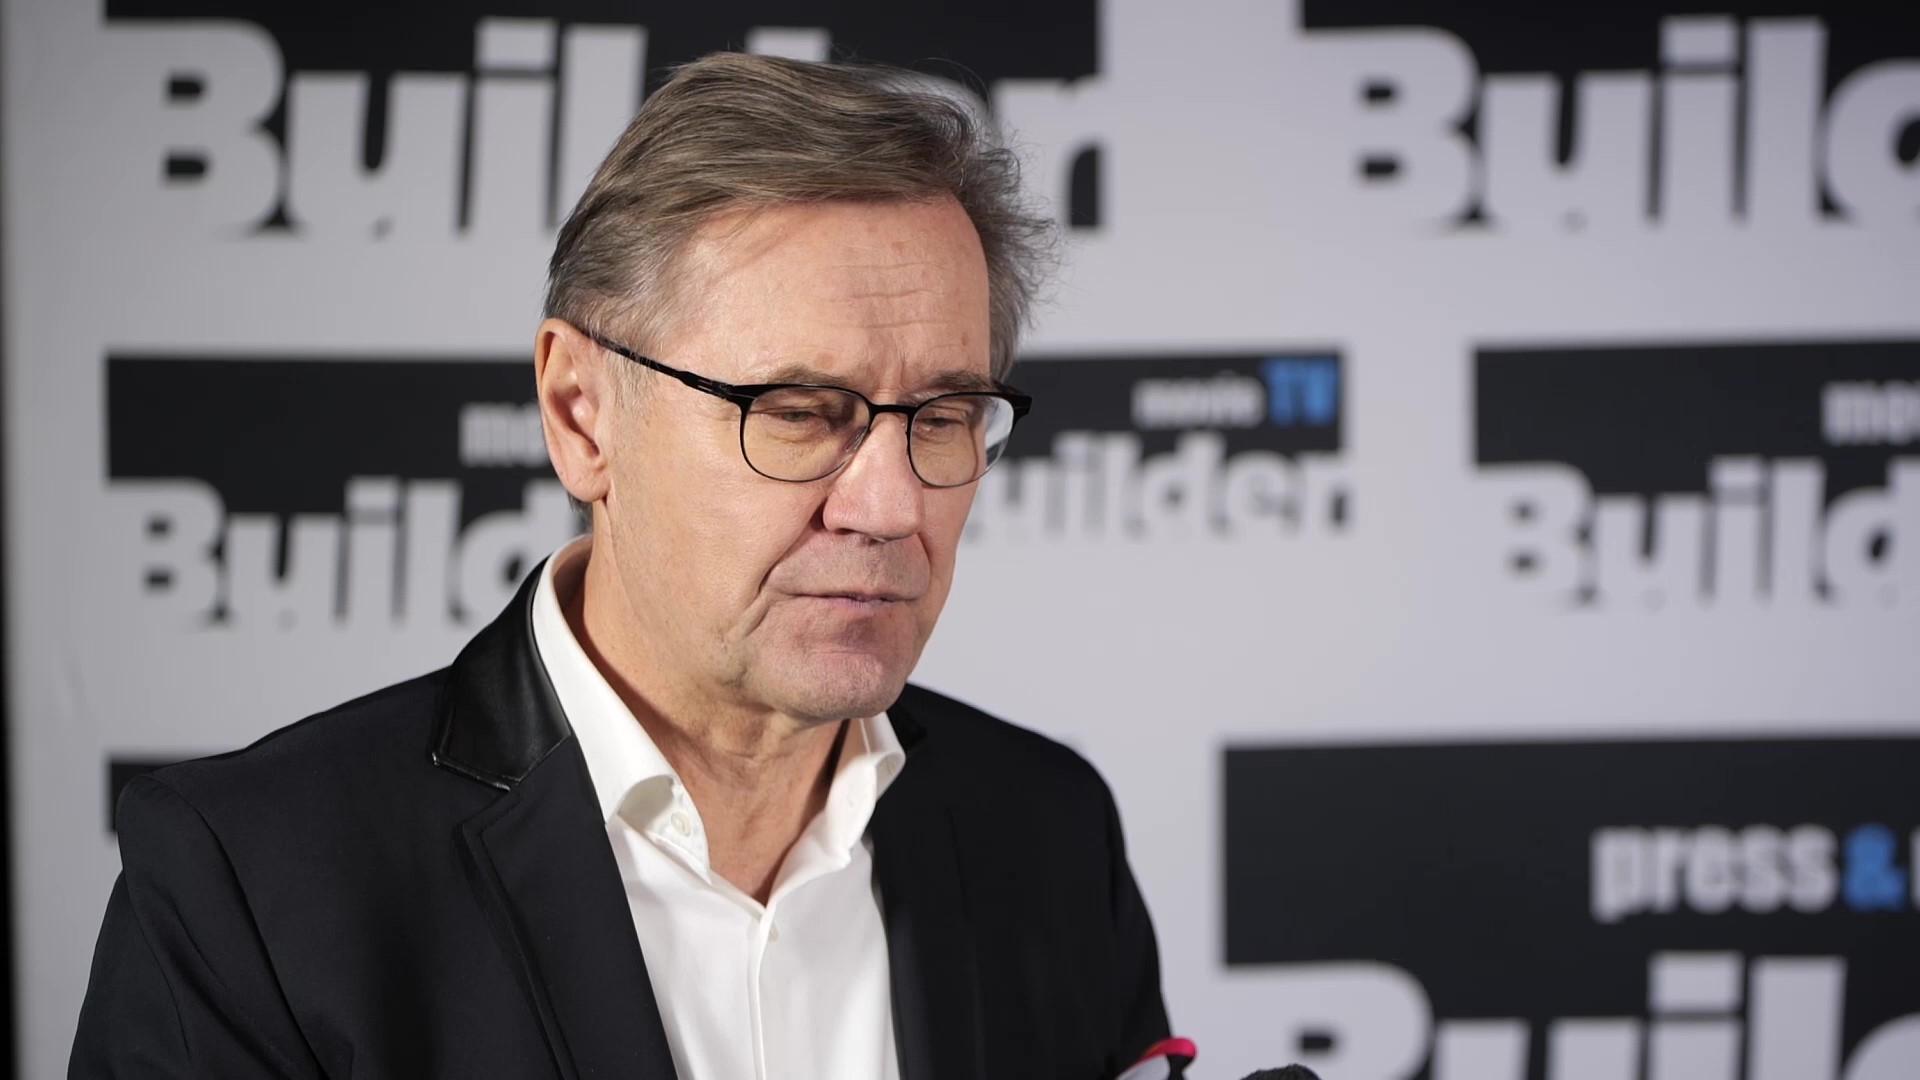 GALA BUILDER AWARDS 2019 – ZBIGNIEW RESZKA, ARCH-DECO SP. Z O.O. CZ. 2